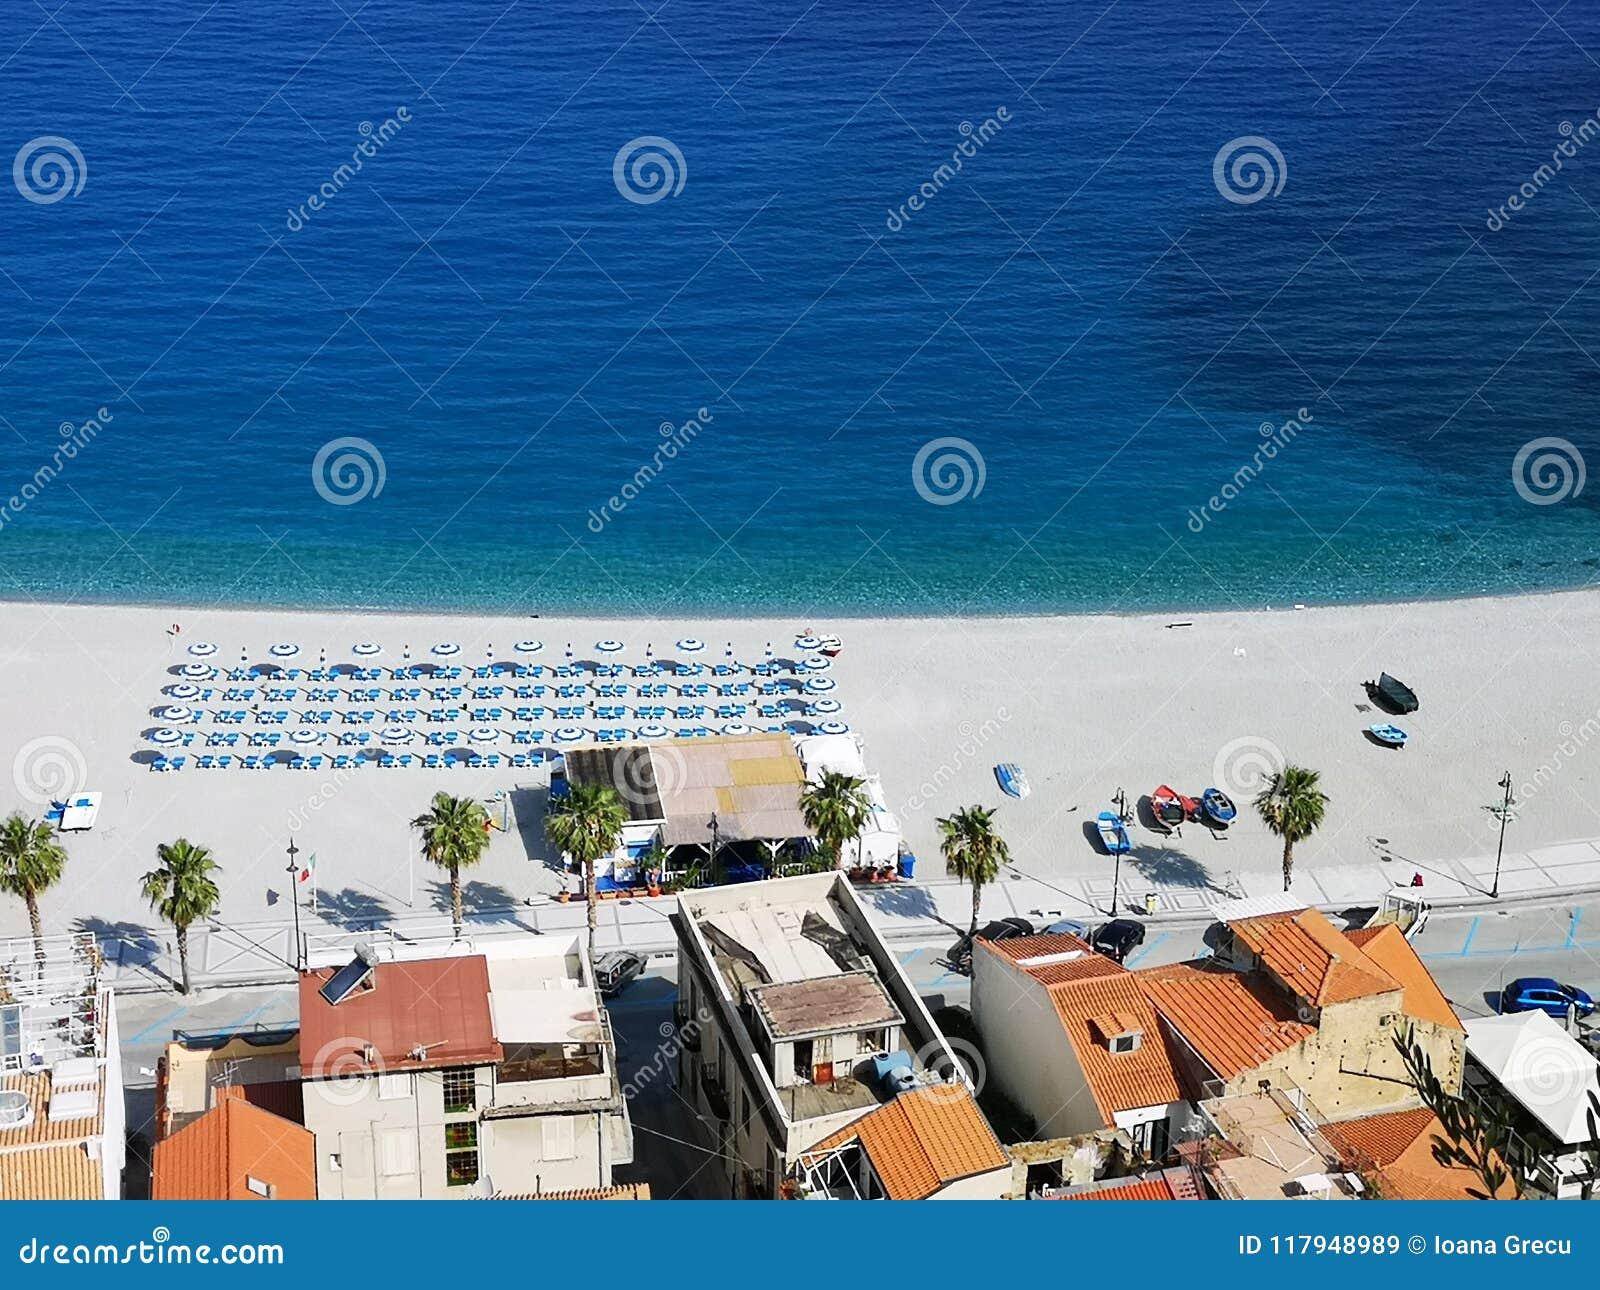 beach town of Scilla, Italy